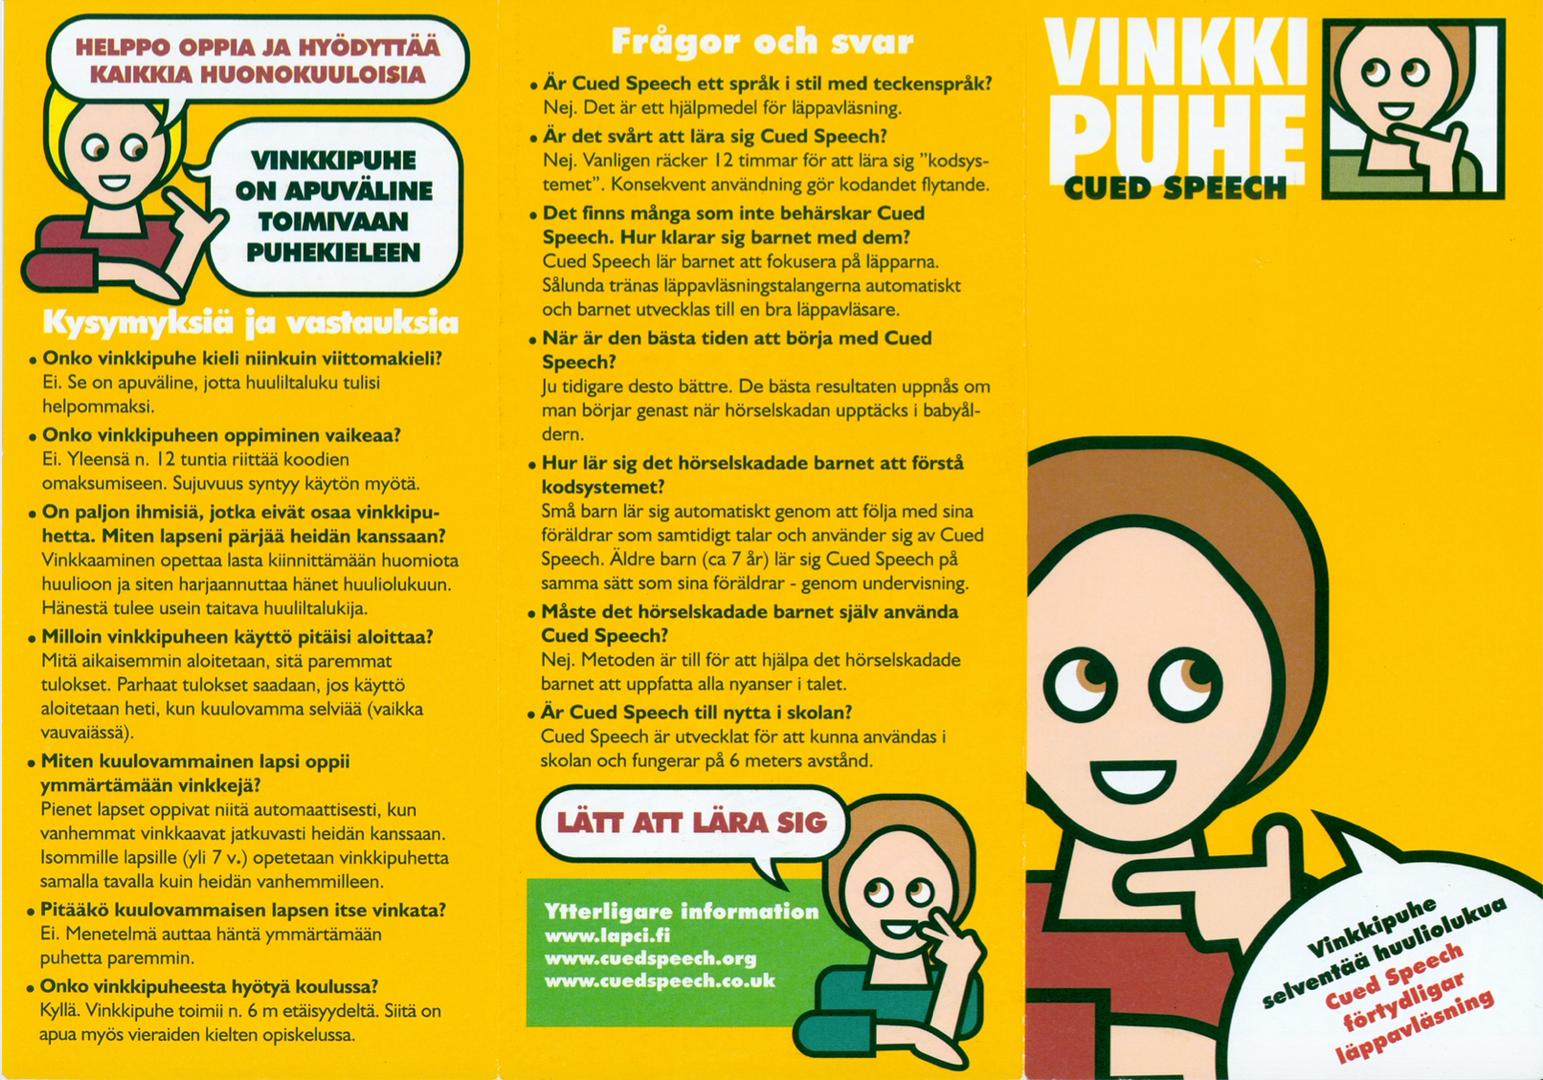 Vinkkepuhe (Finnish CS)